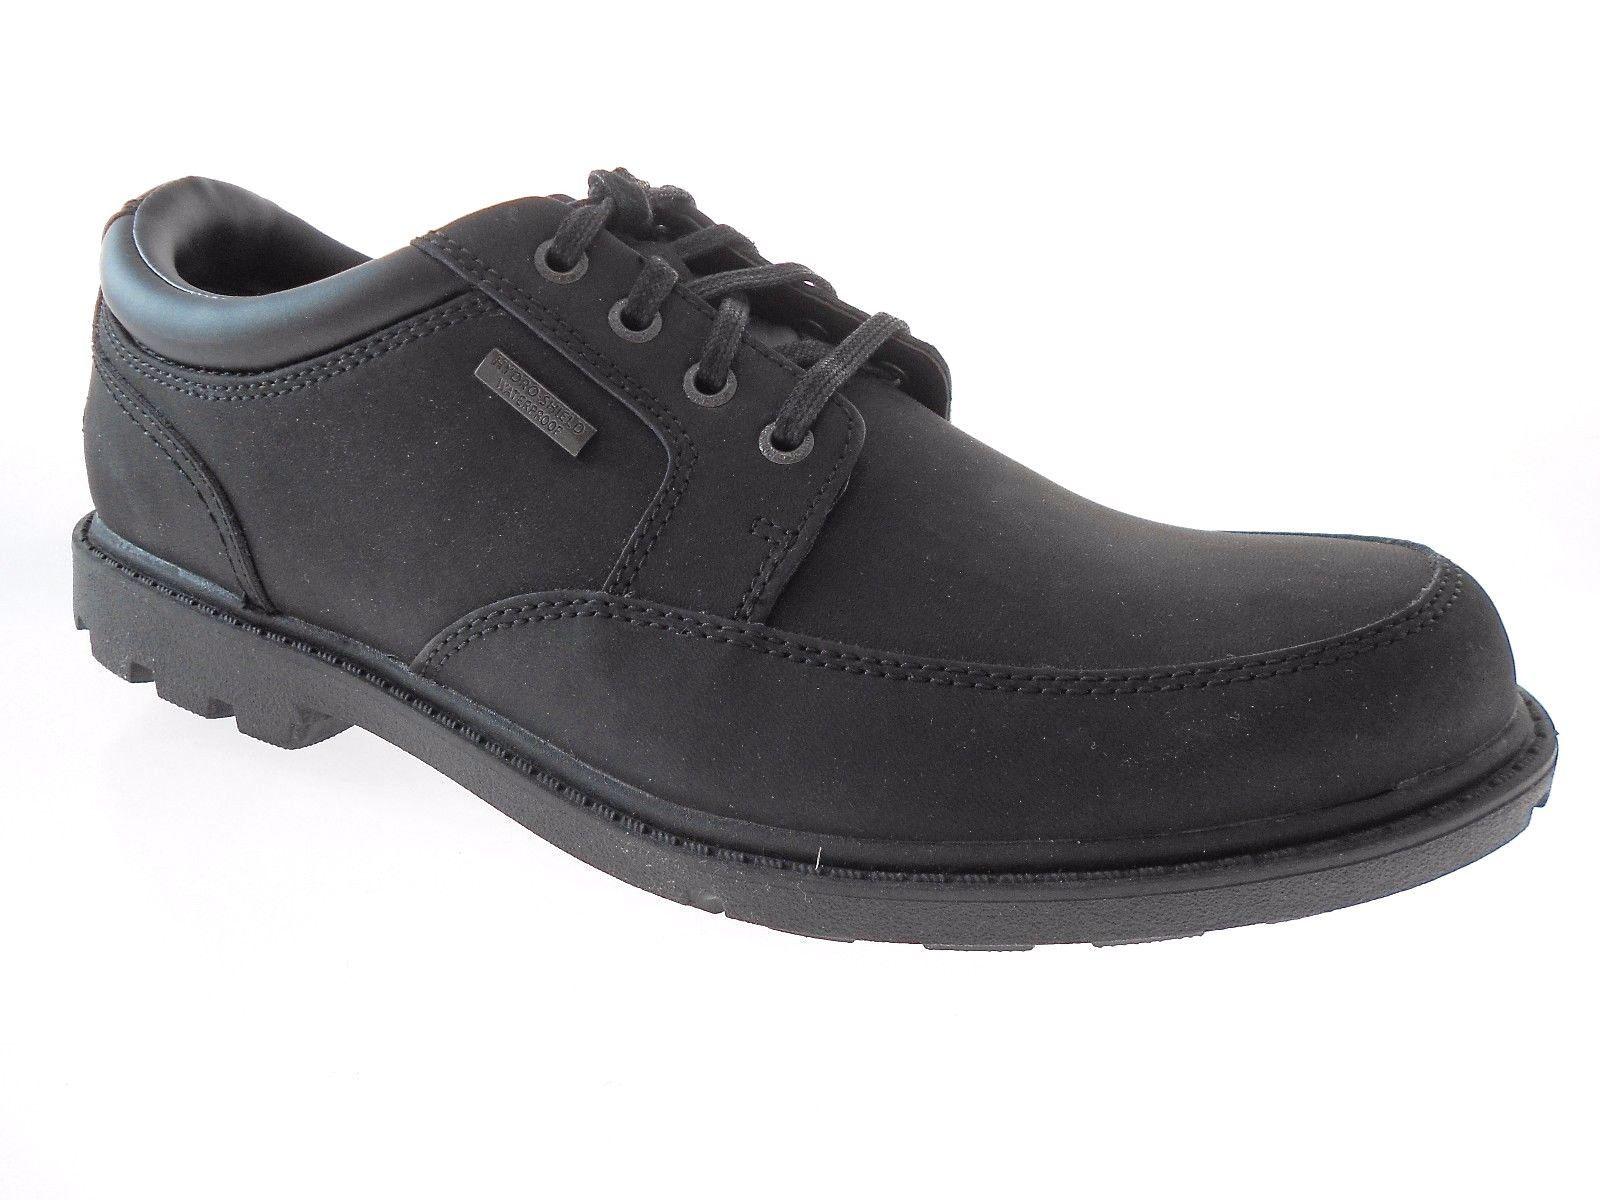 ROCKPORT K74357 MOCTOE  MEN'S BLACK NUBUCK CASUAL WALKING SHOES SZ 8 - $93.59